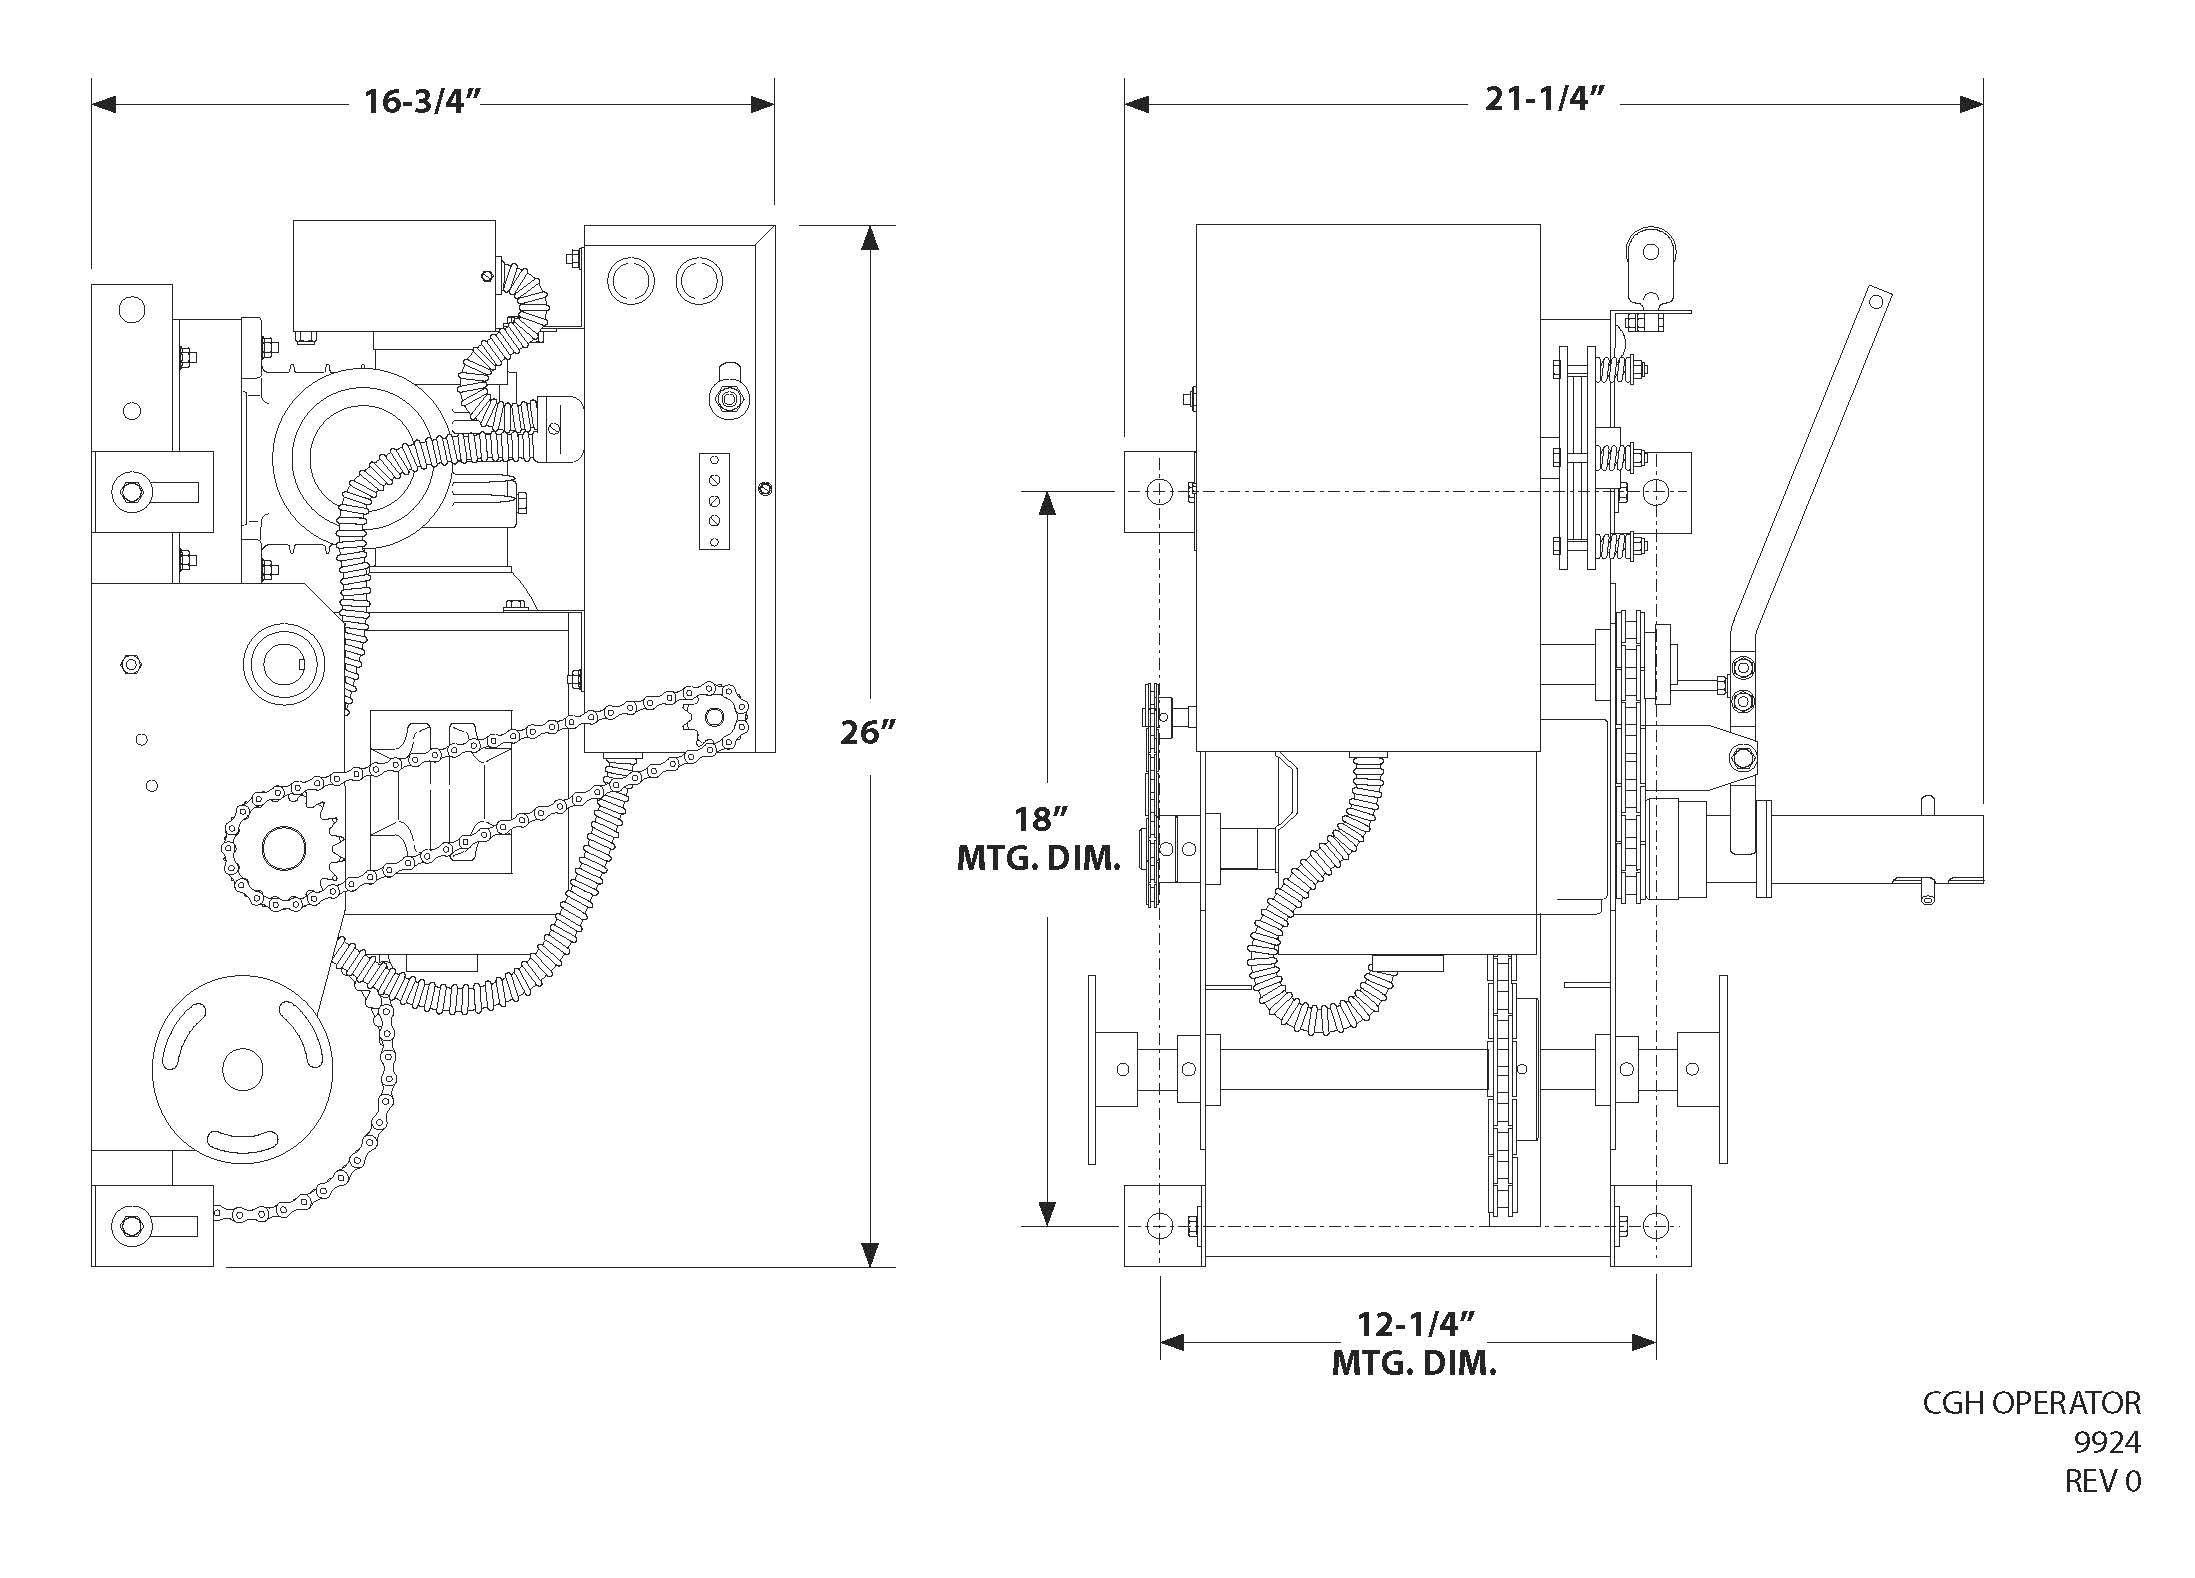 CGH Line Drawing